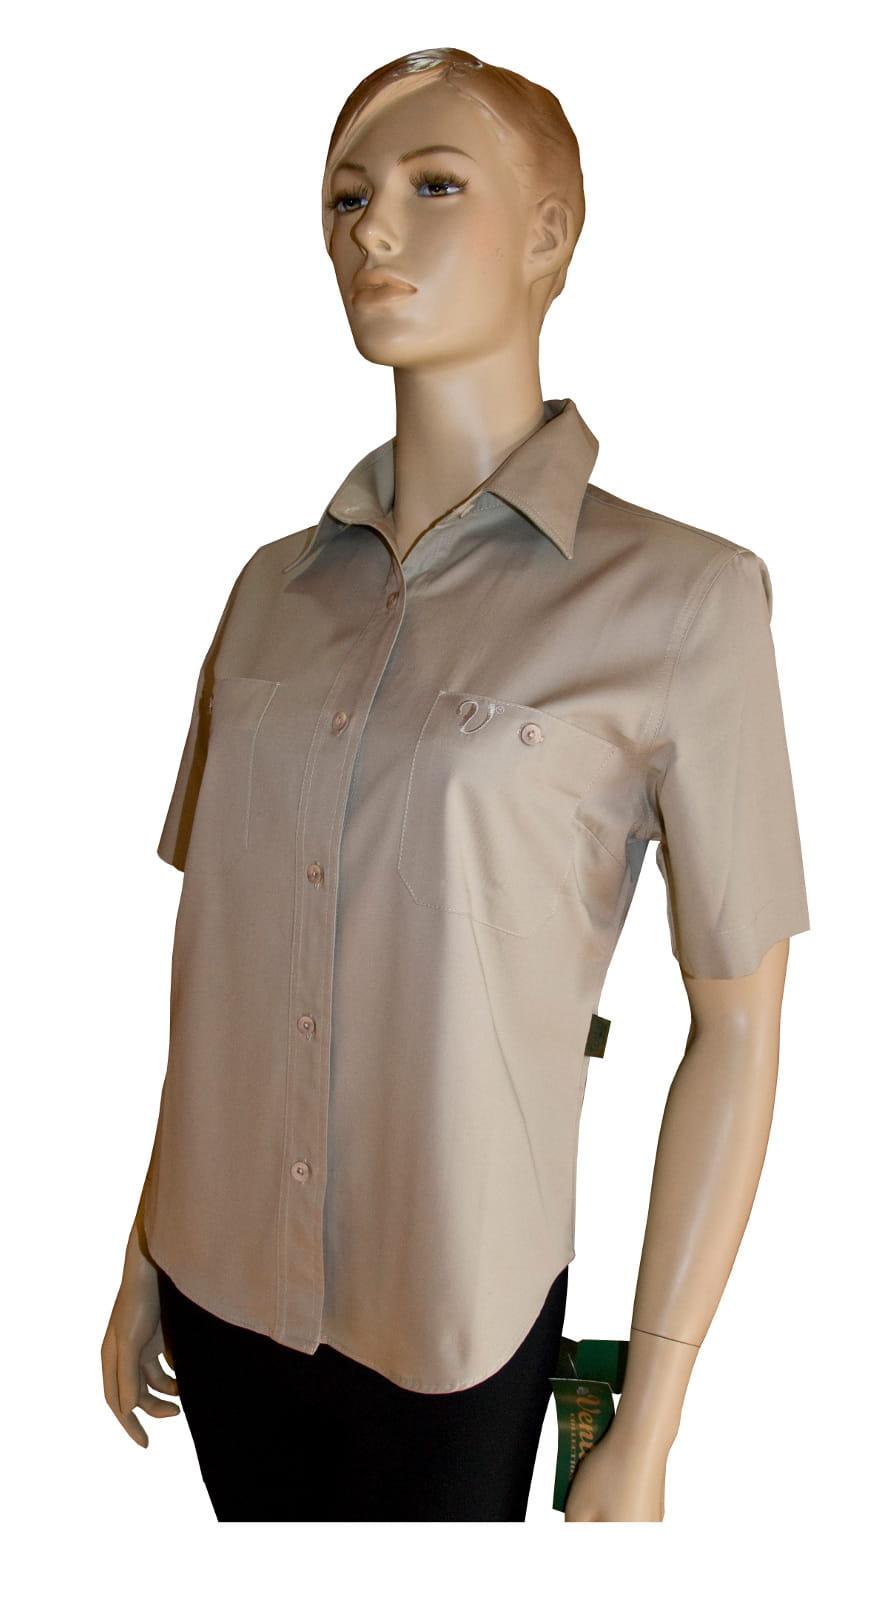 97347baeec8e2c koszule damskie Safari producent, koszule sportowe damskie z krótkim ...